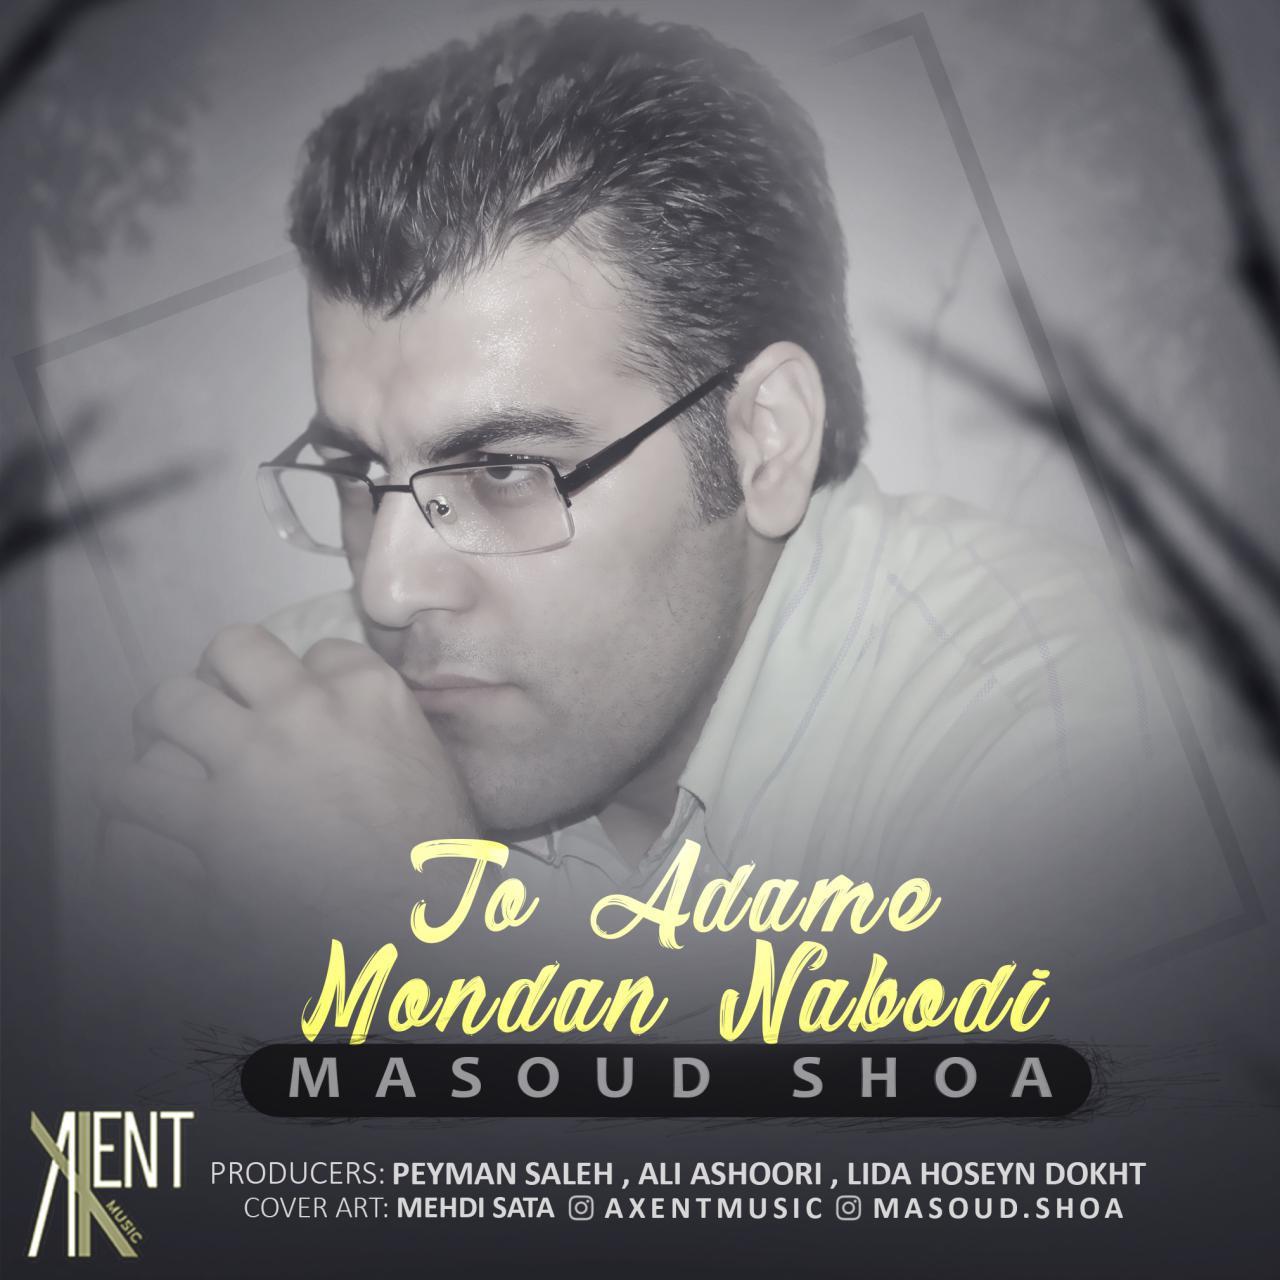 Masood Shoa – To Adame Mondan Nabodi